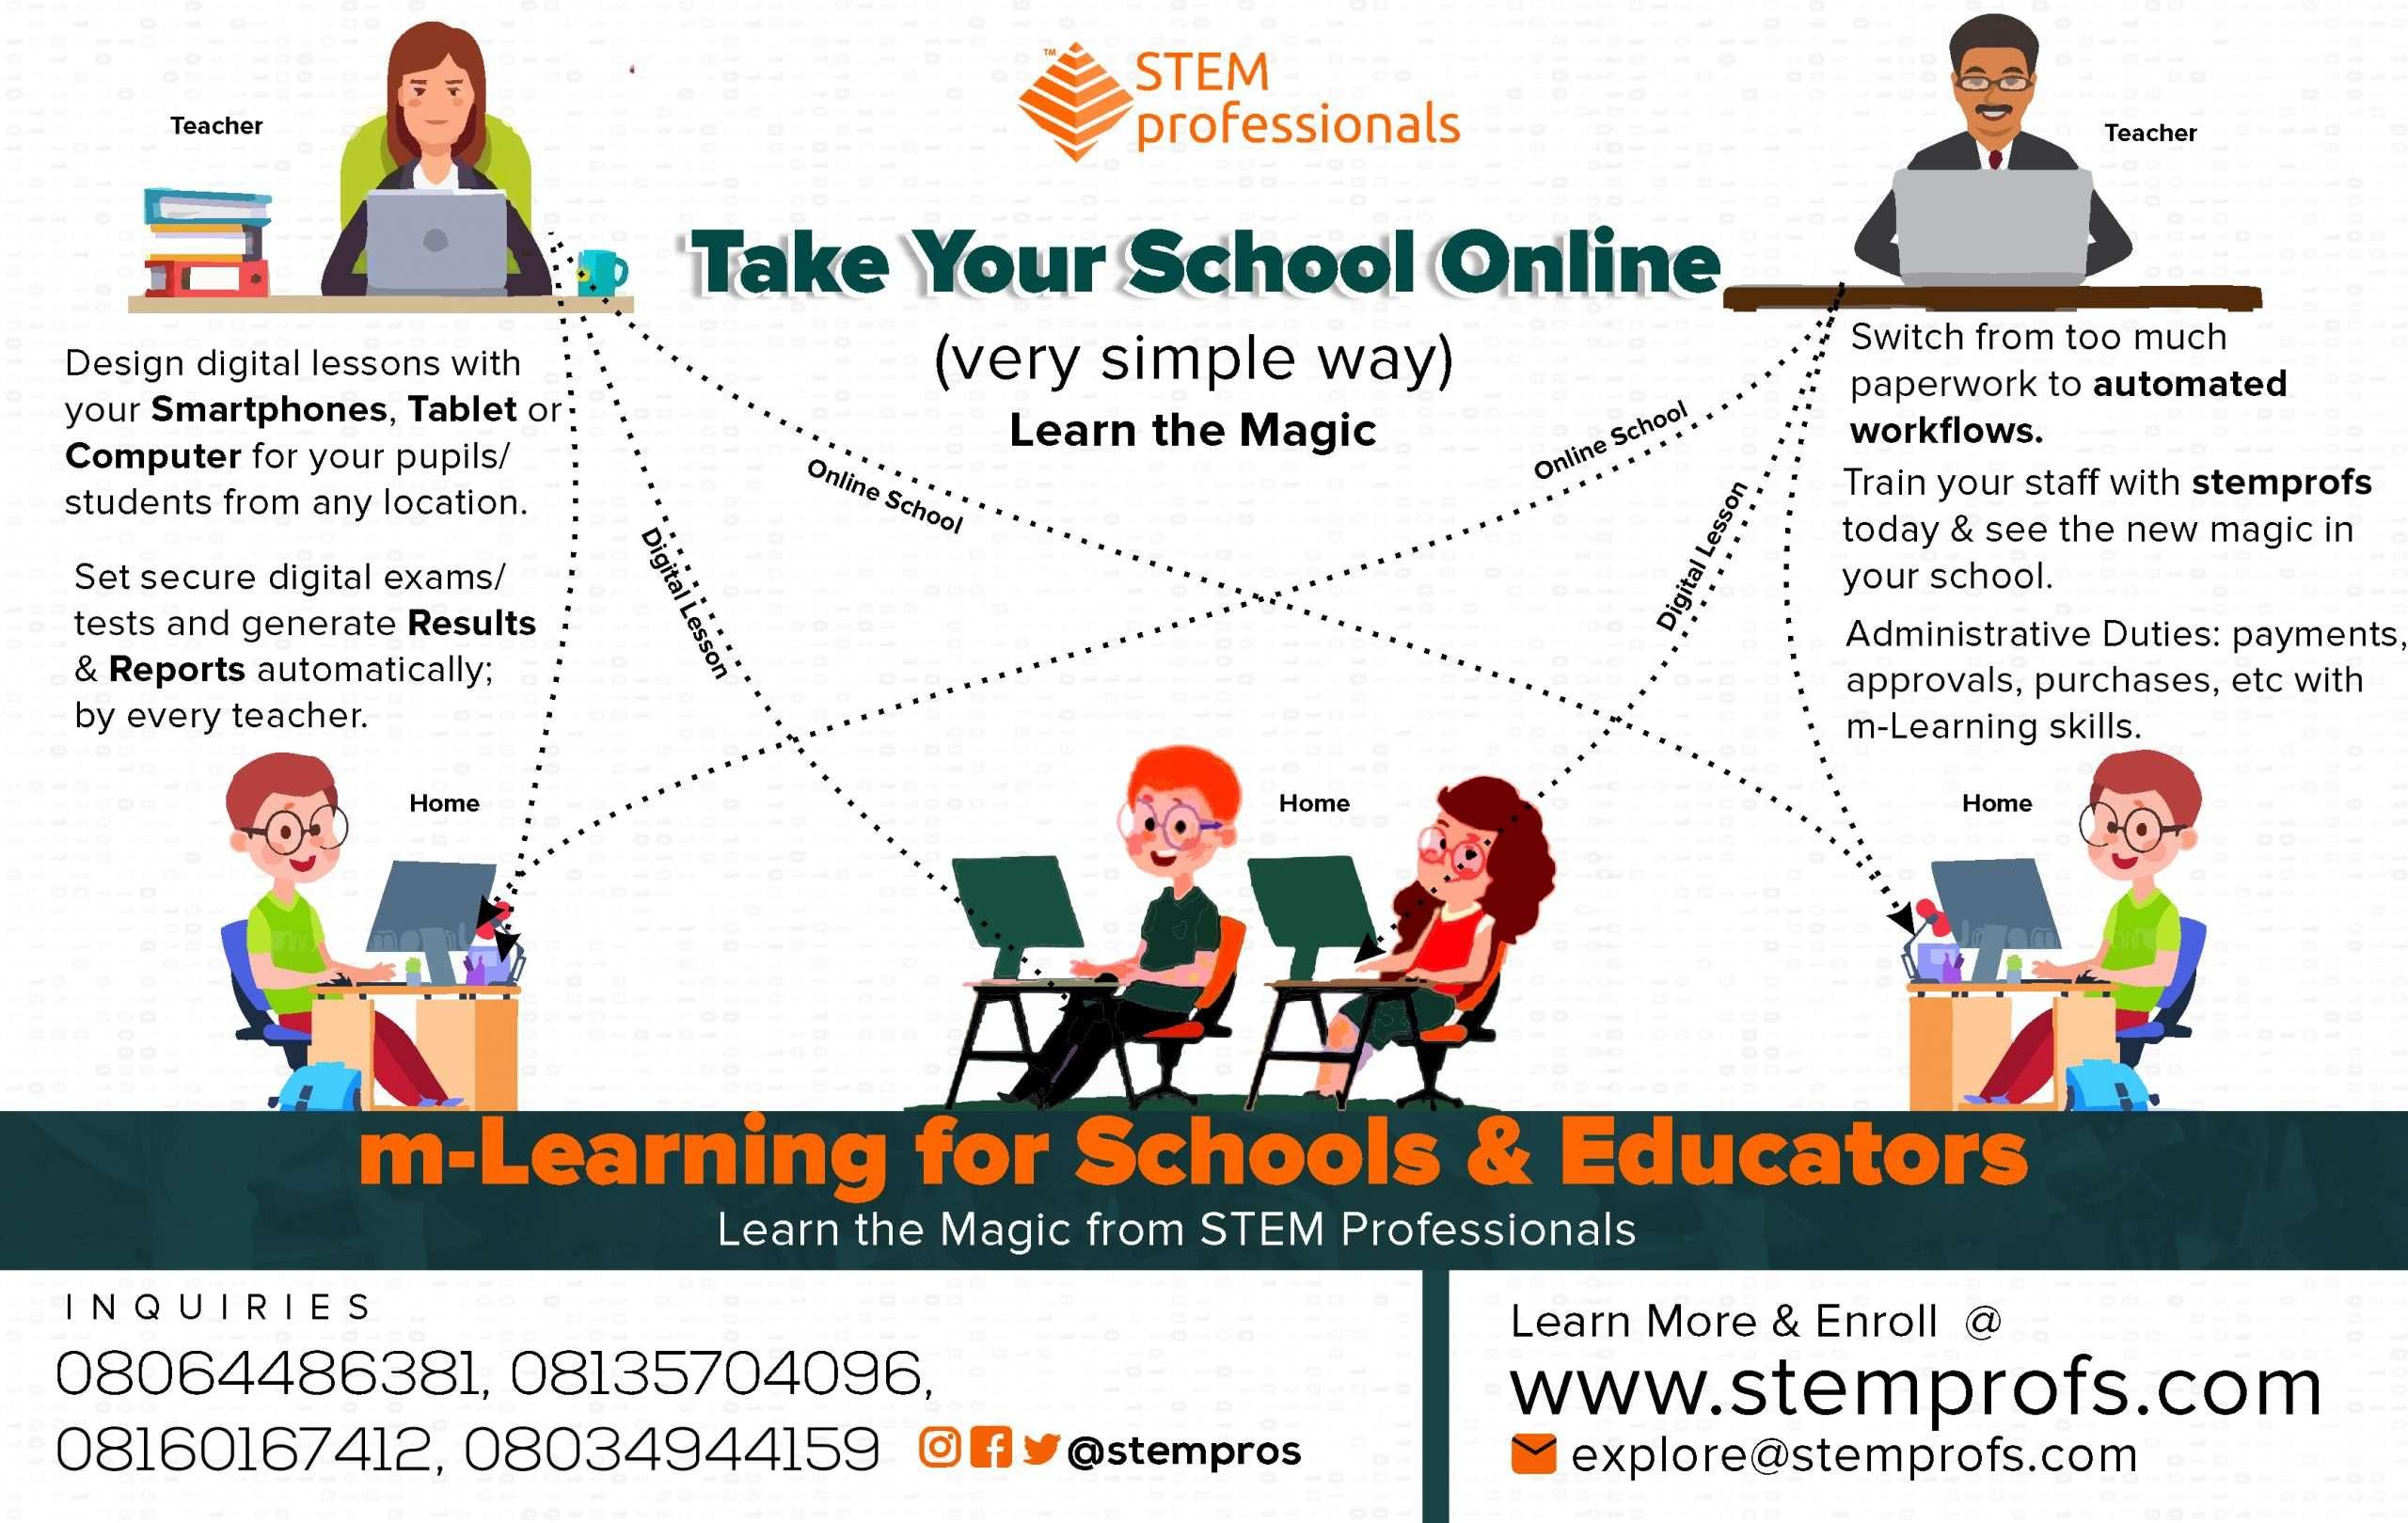 m-Learning 4 Educators